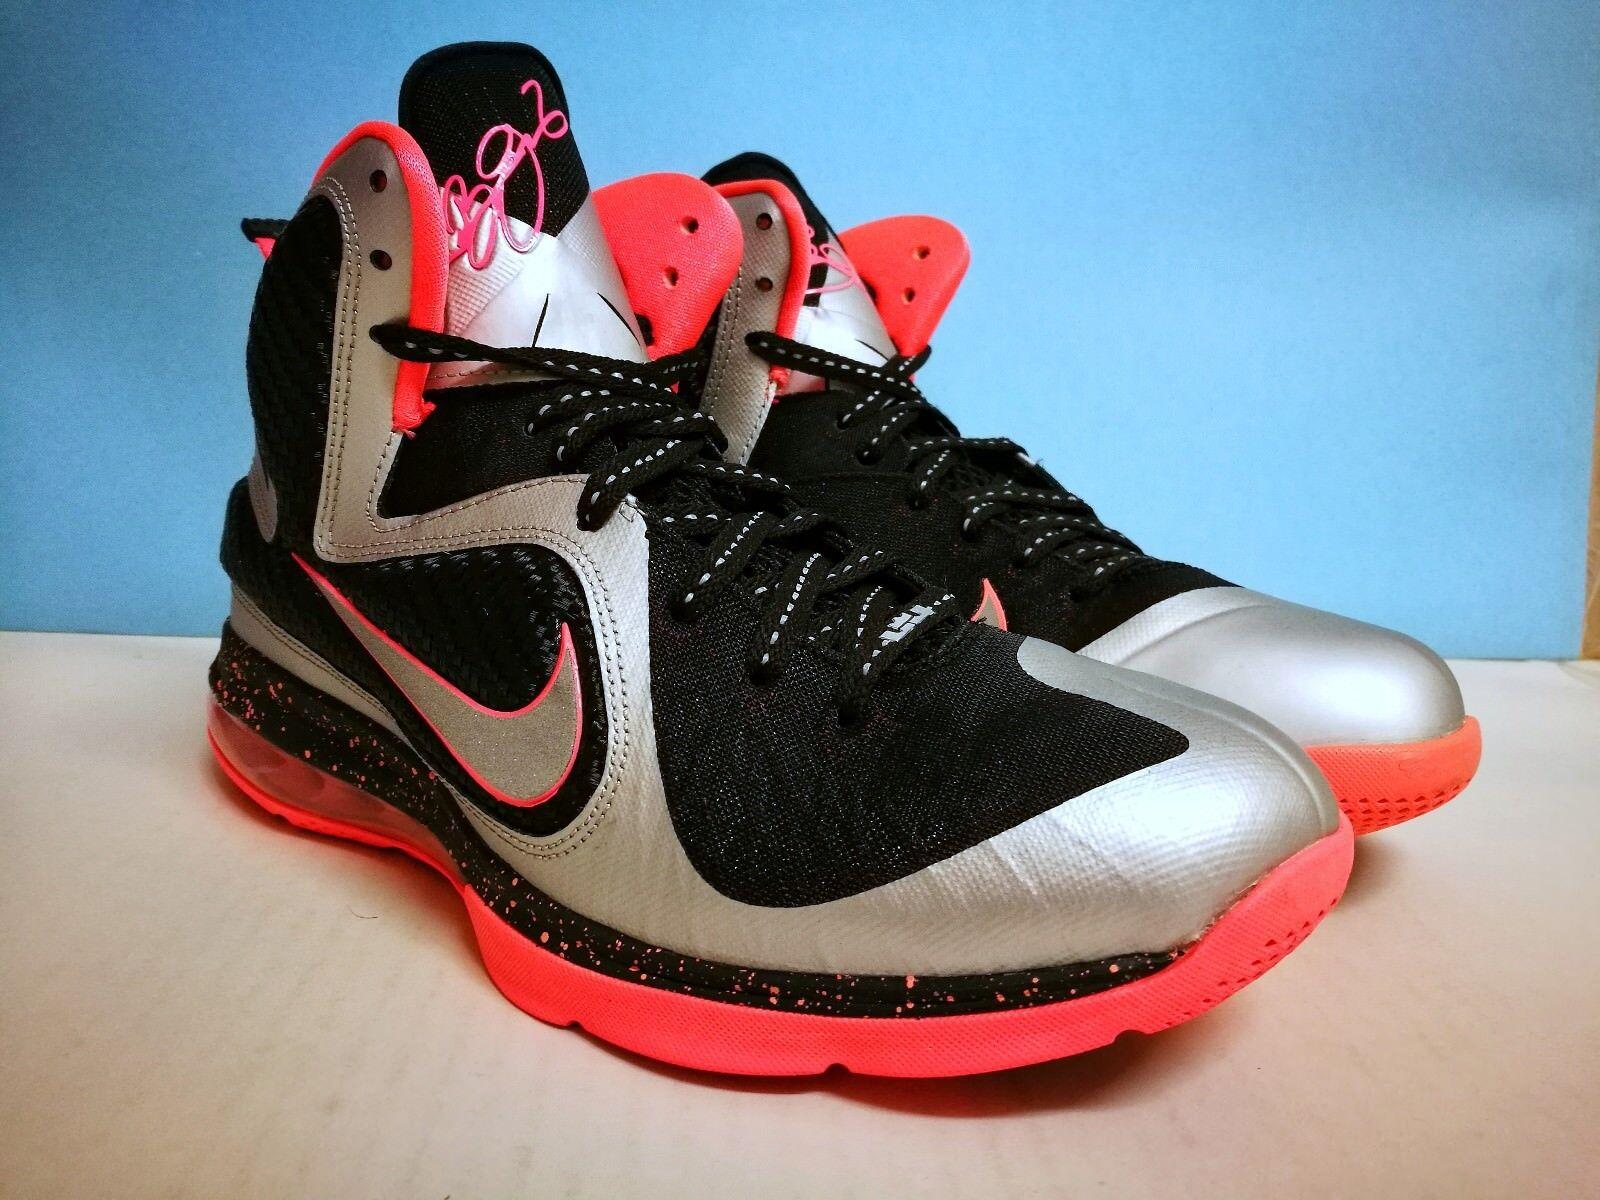 Nike Lebron IX (9) ++ MANGO ++ sz 9   42.5 EU 469764 005 Jordan Kobe KD Yeezy